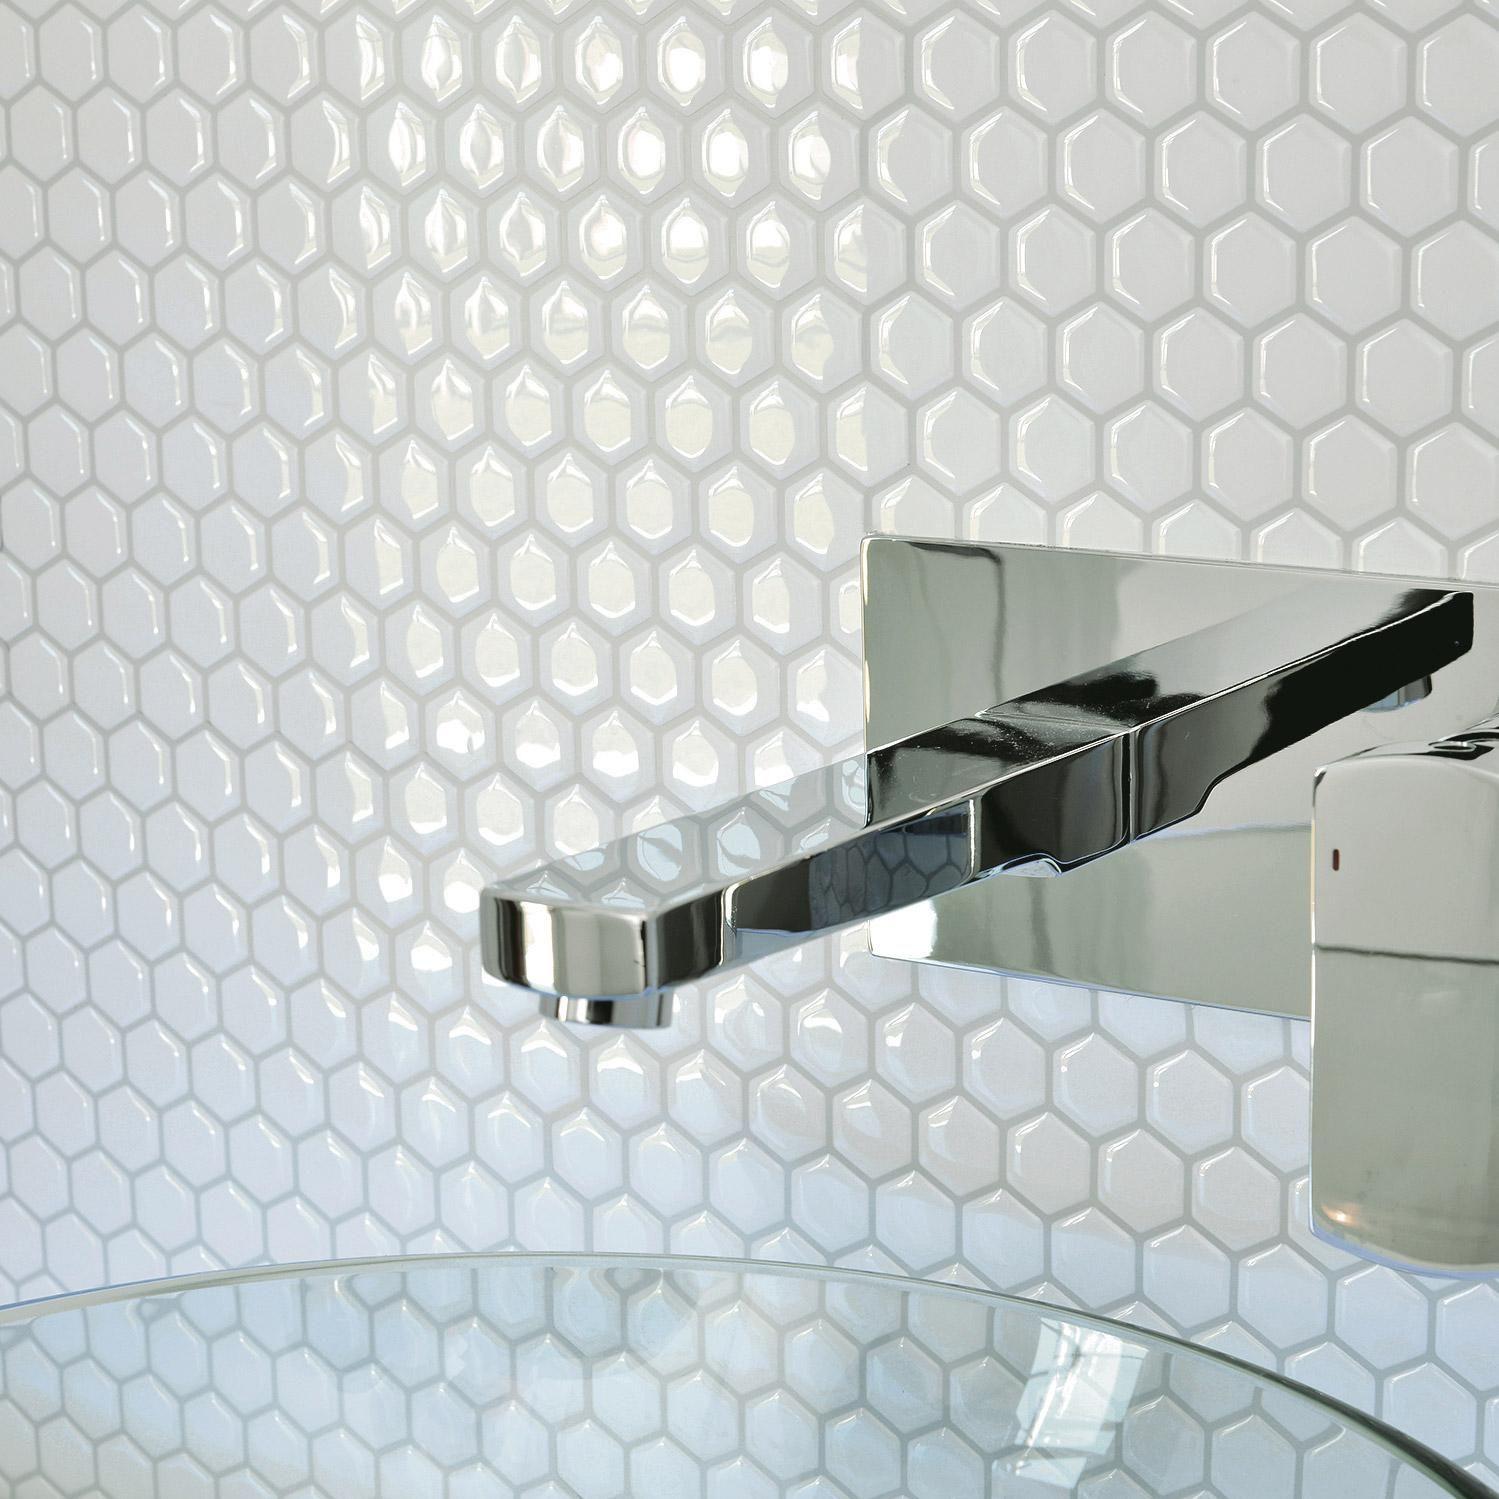 Credence Adhesive Imitant Carrelage Hexagone Blanc L 24 46 X L